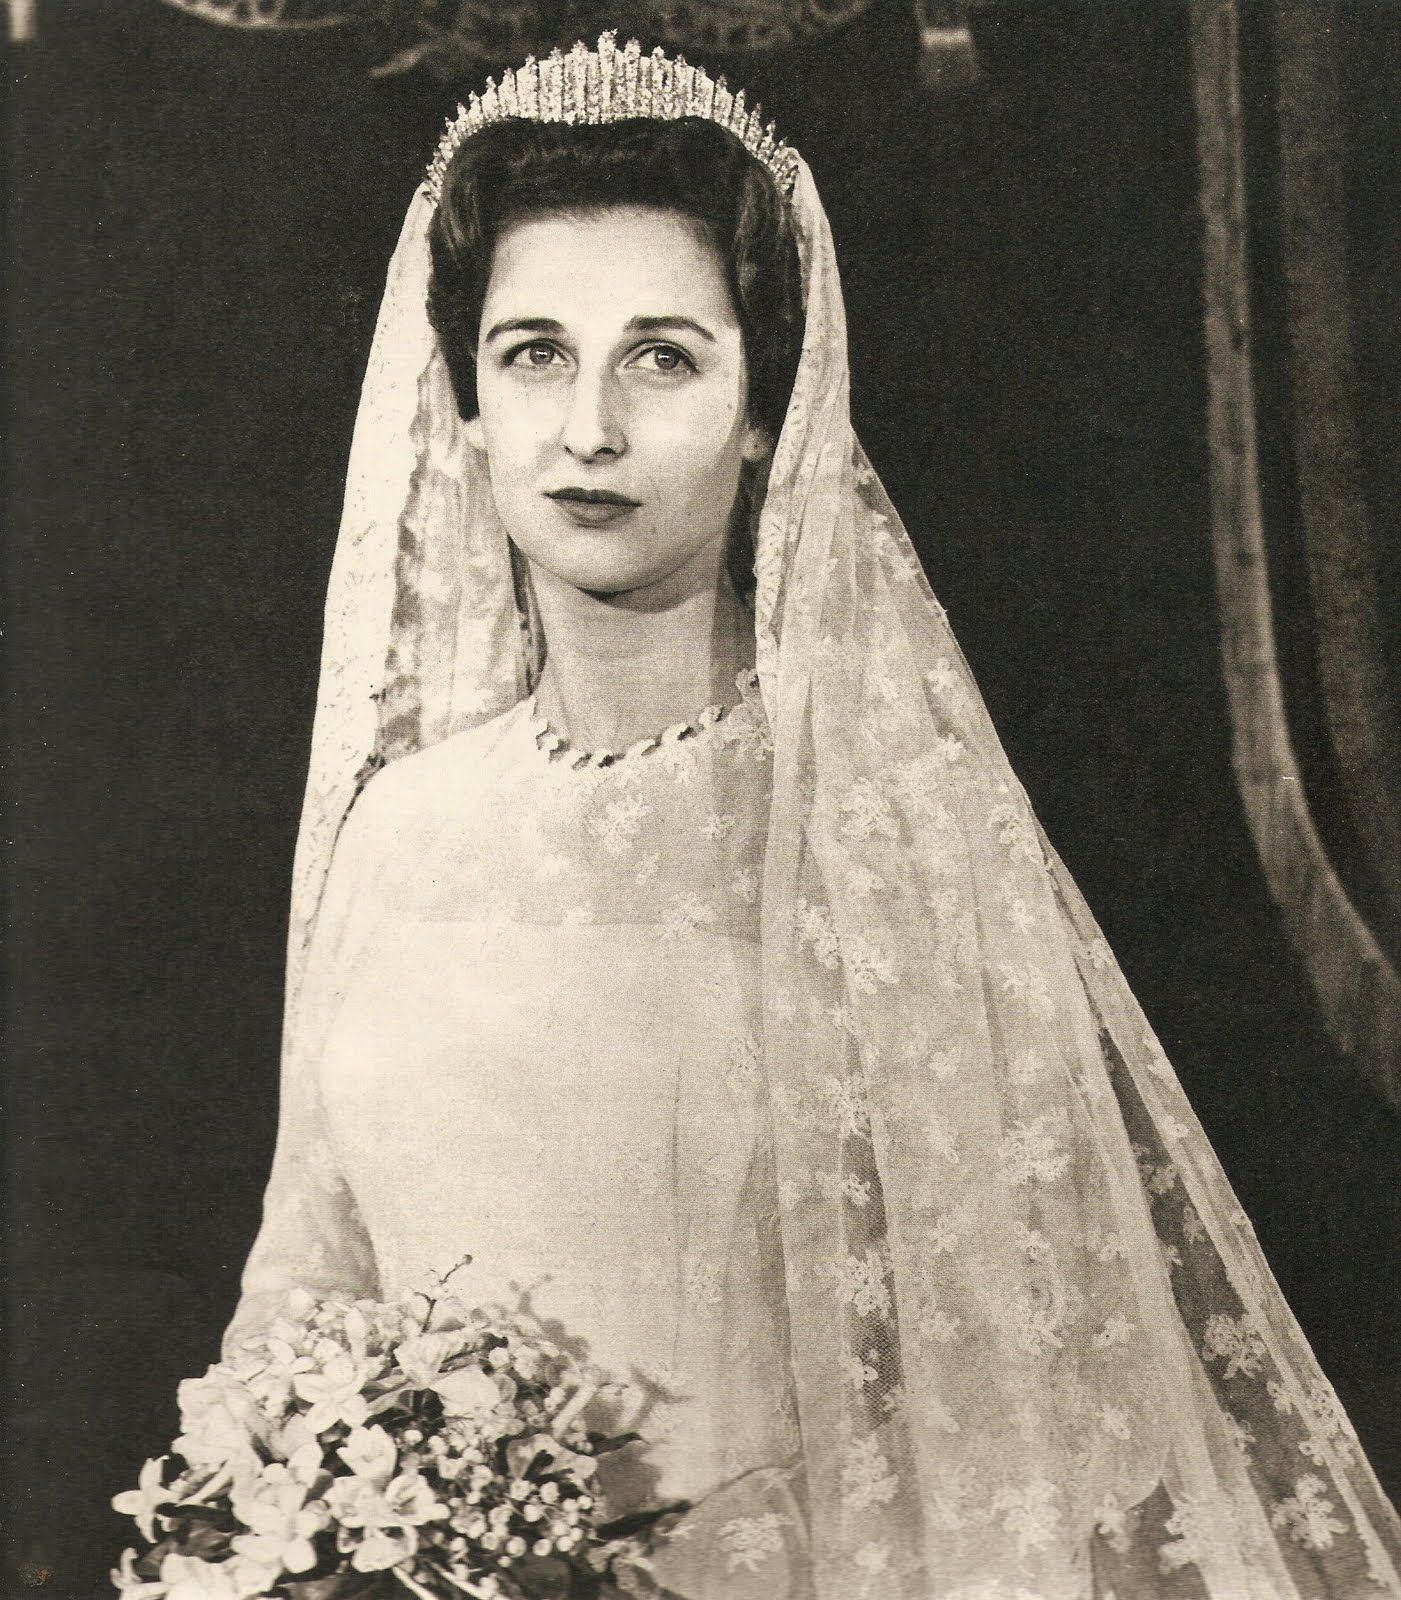 Br bridal headpieces montreal - Bling Fling Royal Crowns And Tiaras